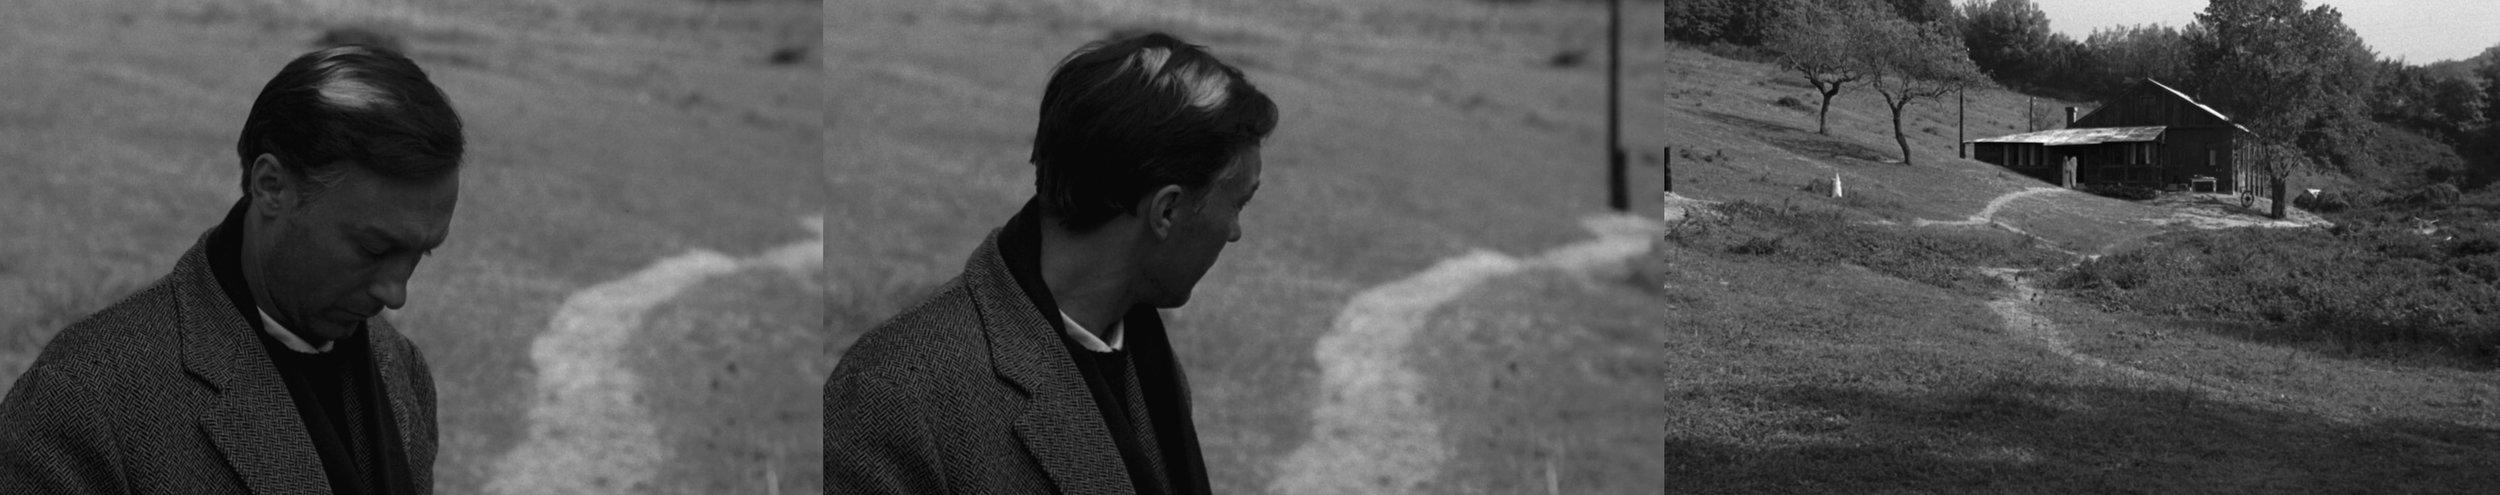 #36 Nostalghia [1983] - dir. Andrei Tarkovsky